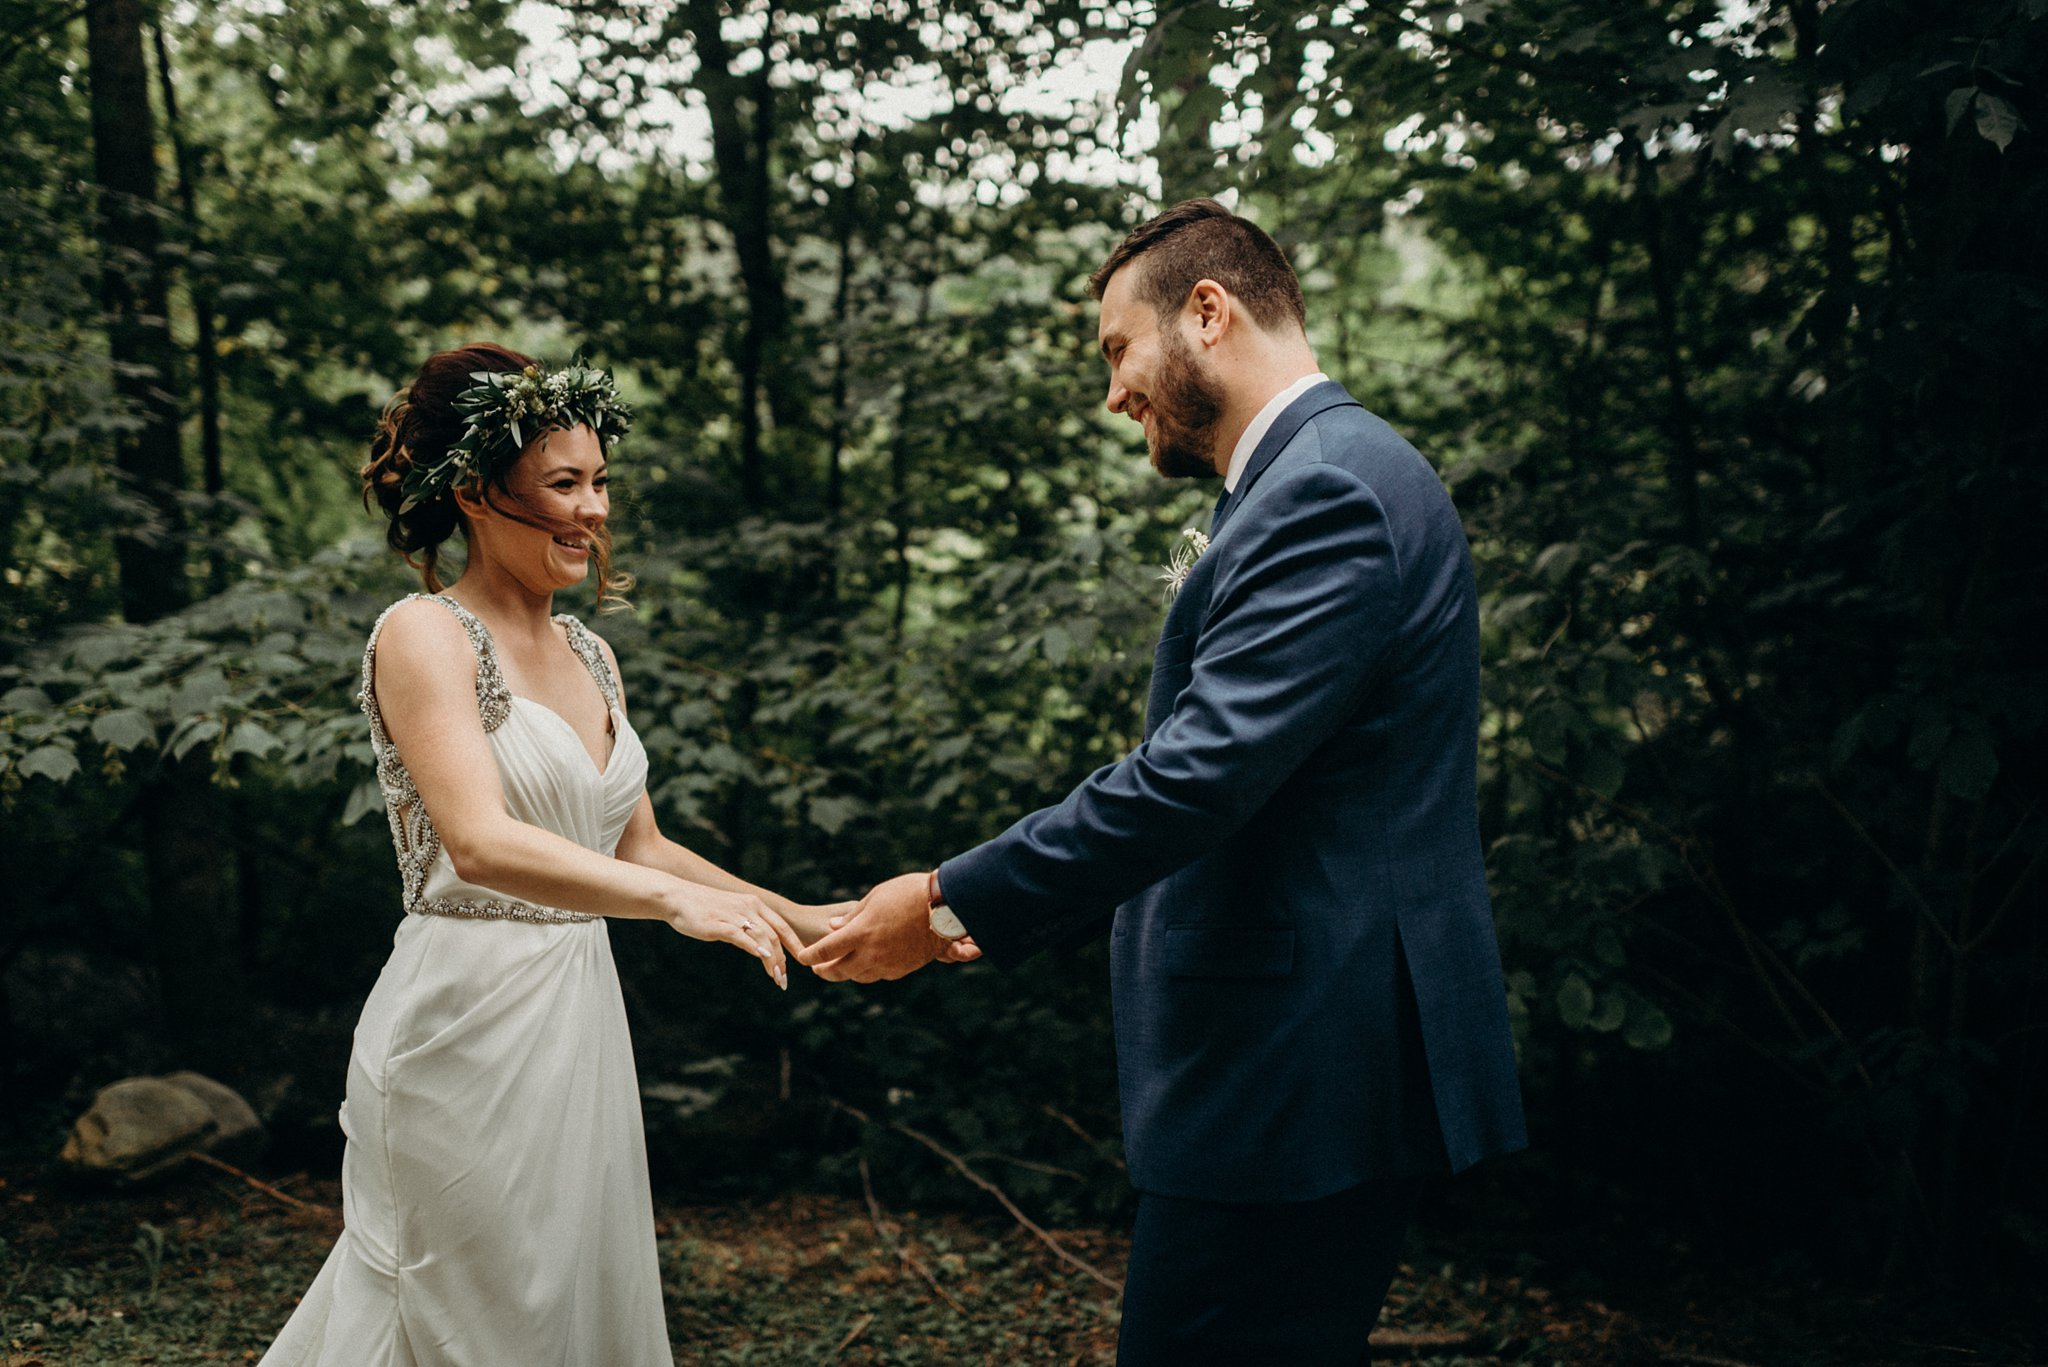 kaihla_tonai_intimate_wedding_elopement_photographer_6577.jpg